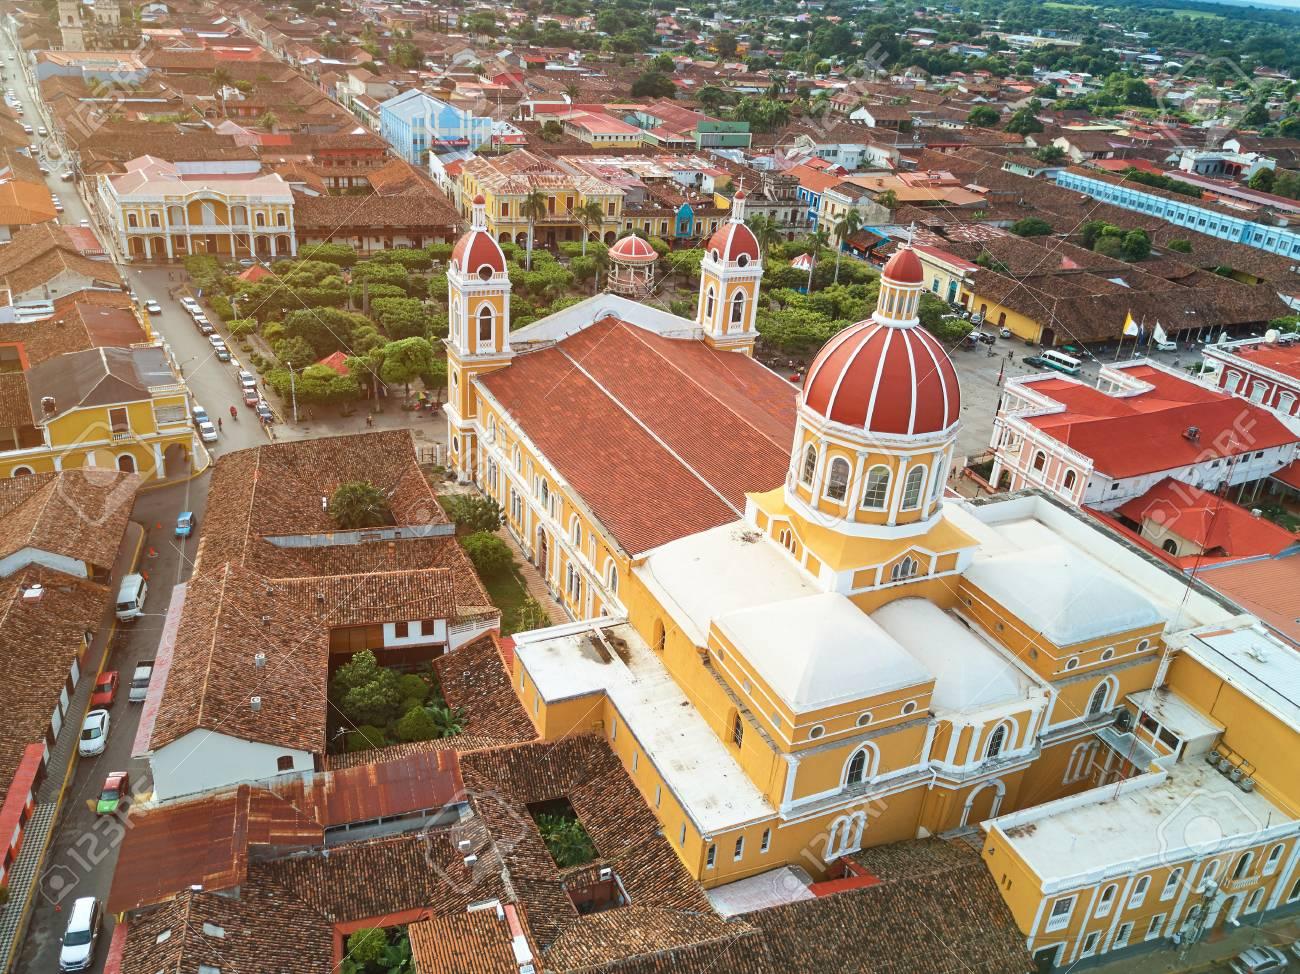 Streets in Granada city Nicaragua aerial drone view - 87589974